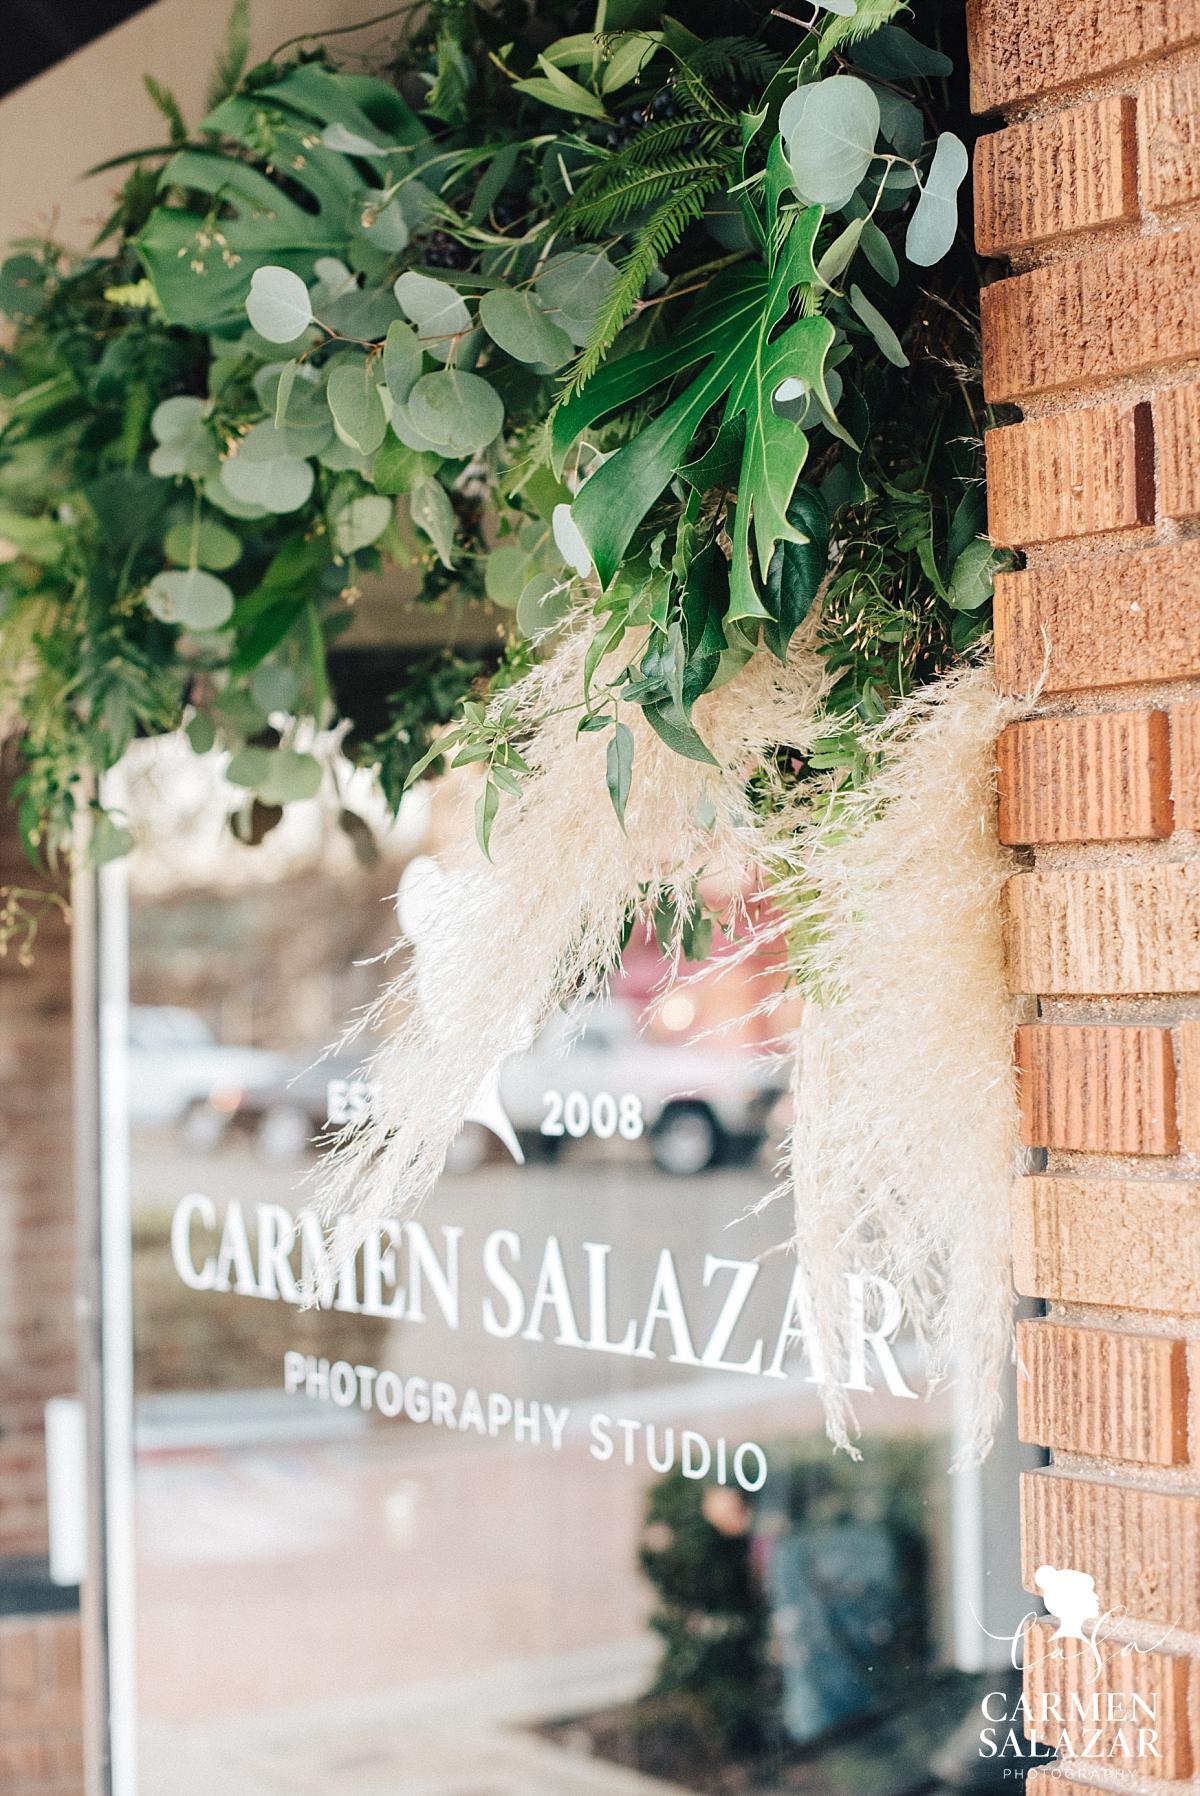 Tropical floral design at photography studio grand opening - Carmen Salazar